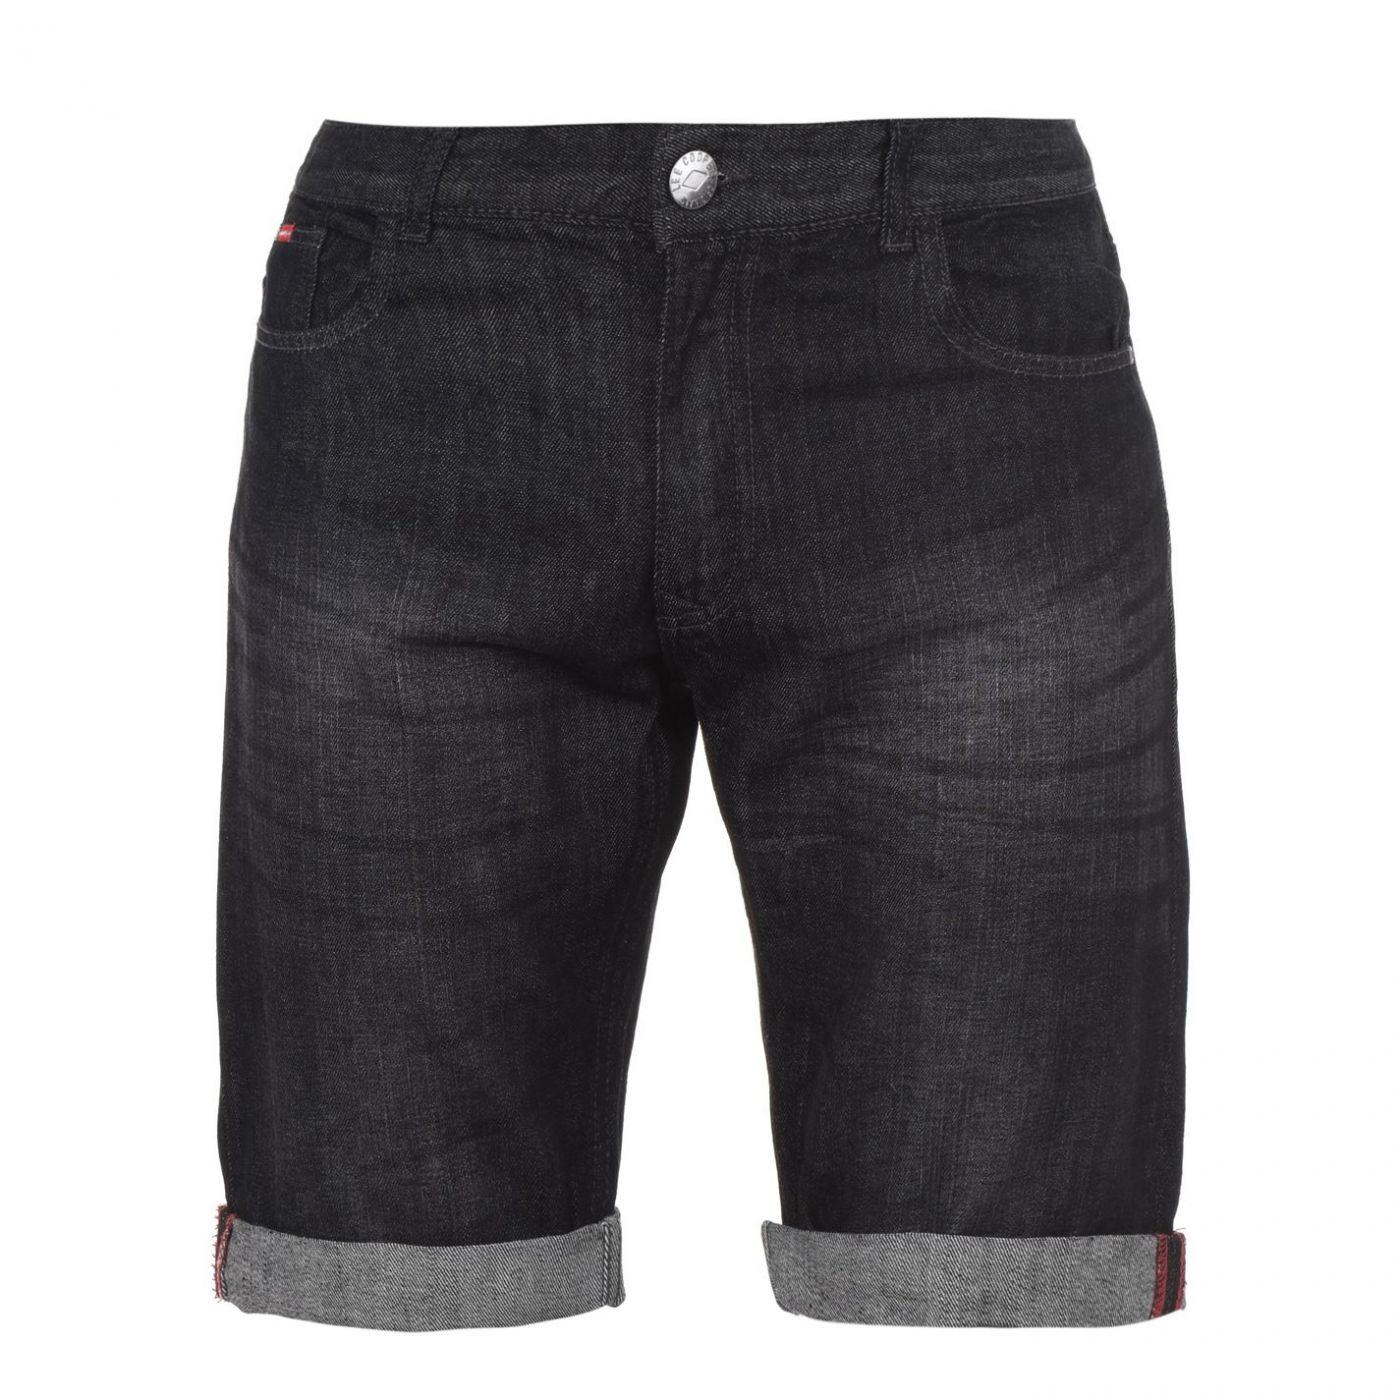 Men's shorts Lee Cooper Denim